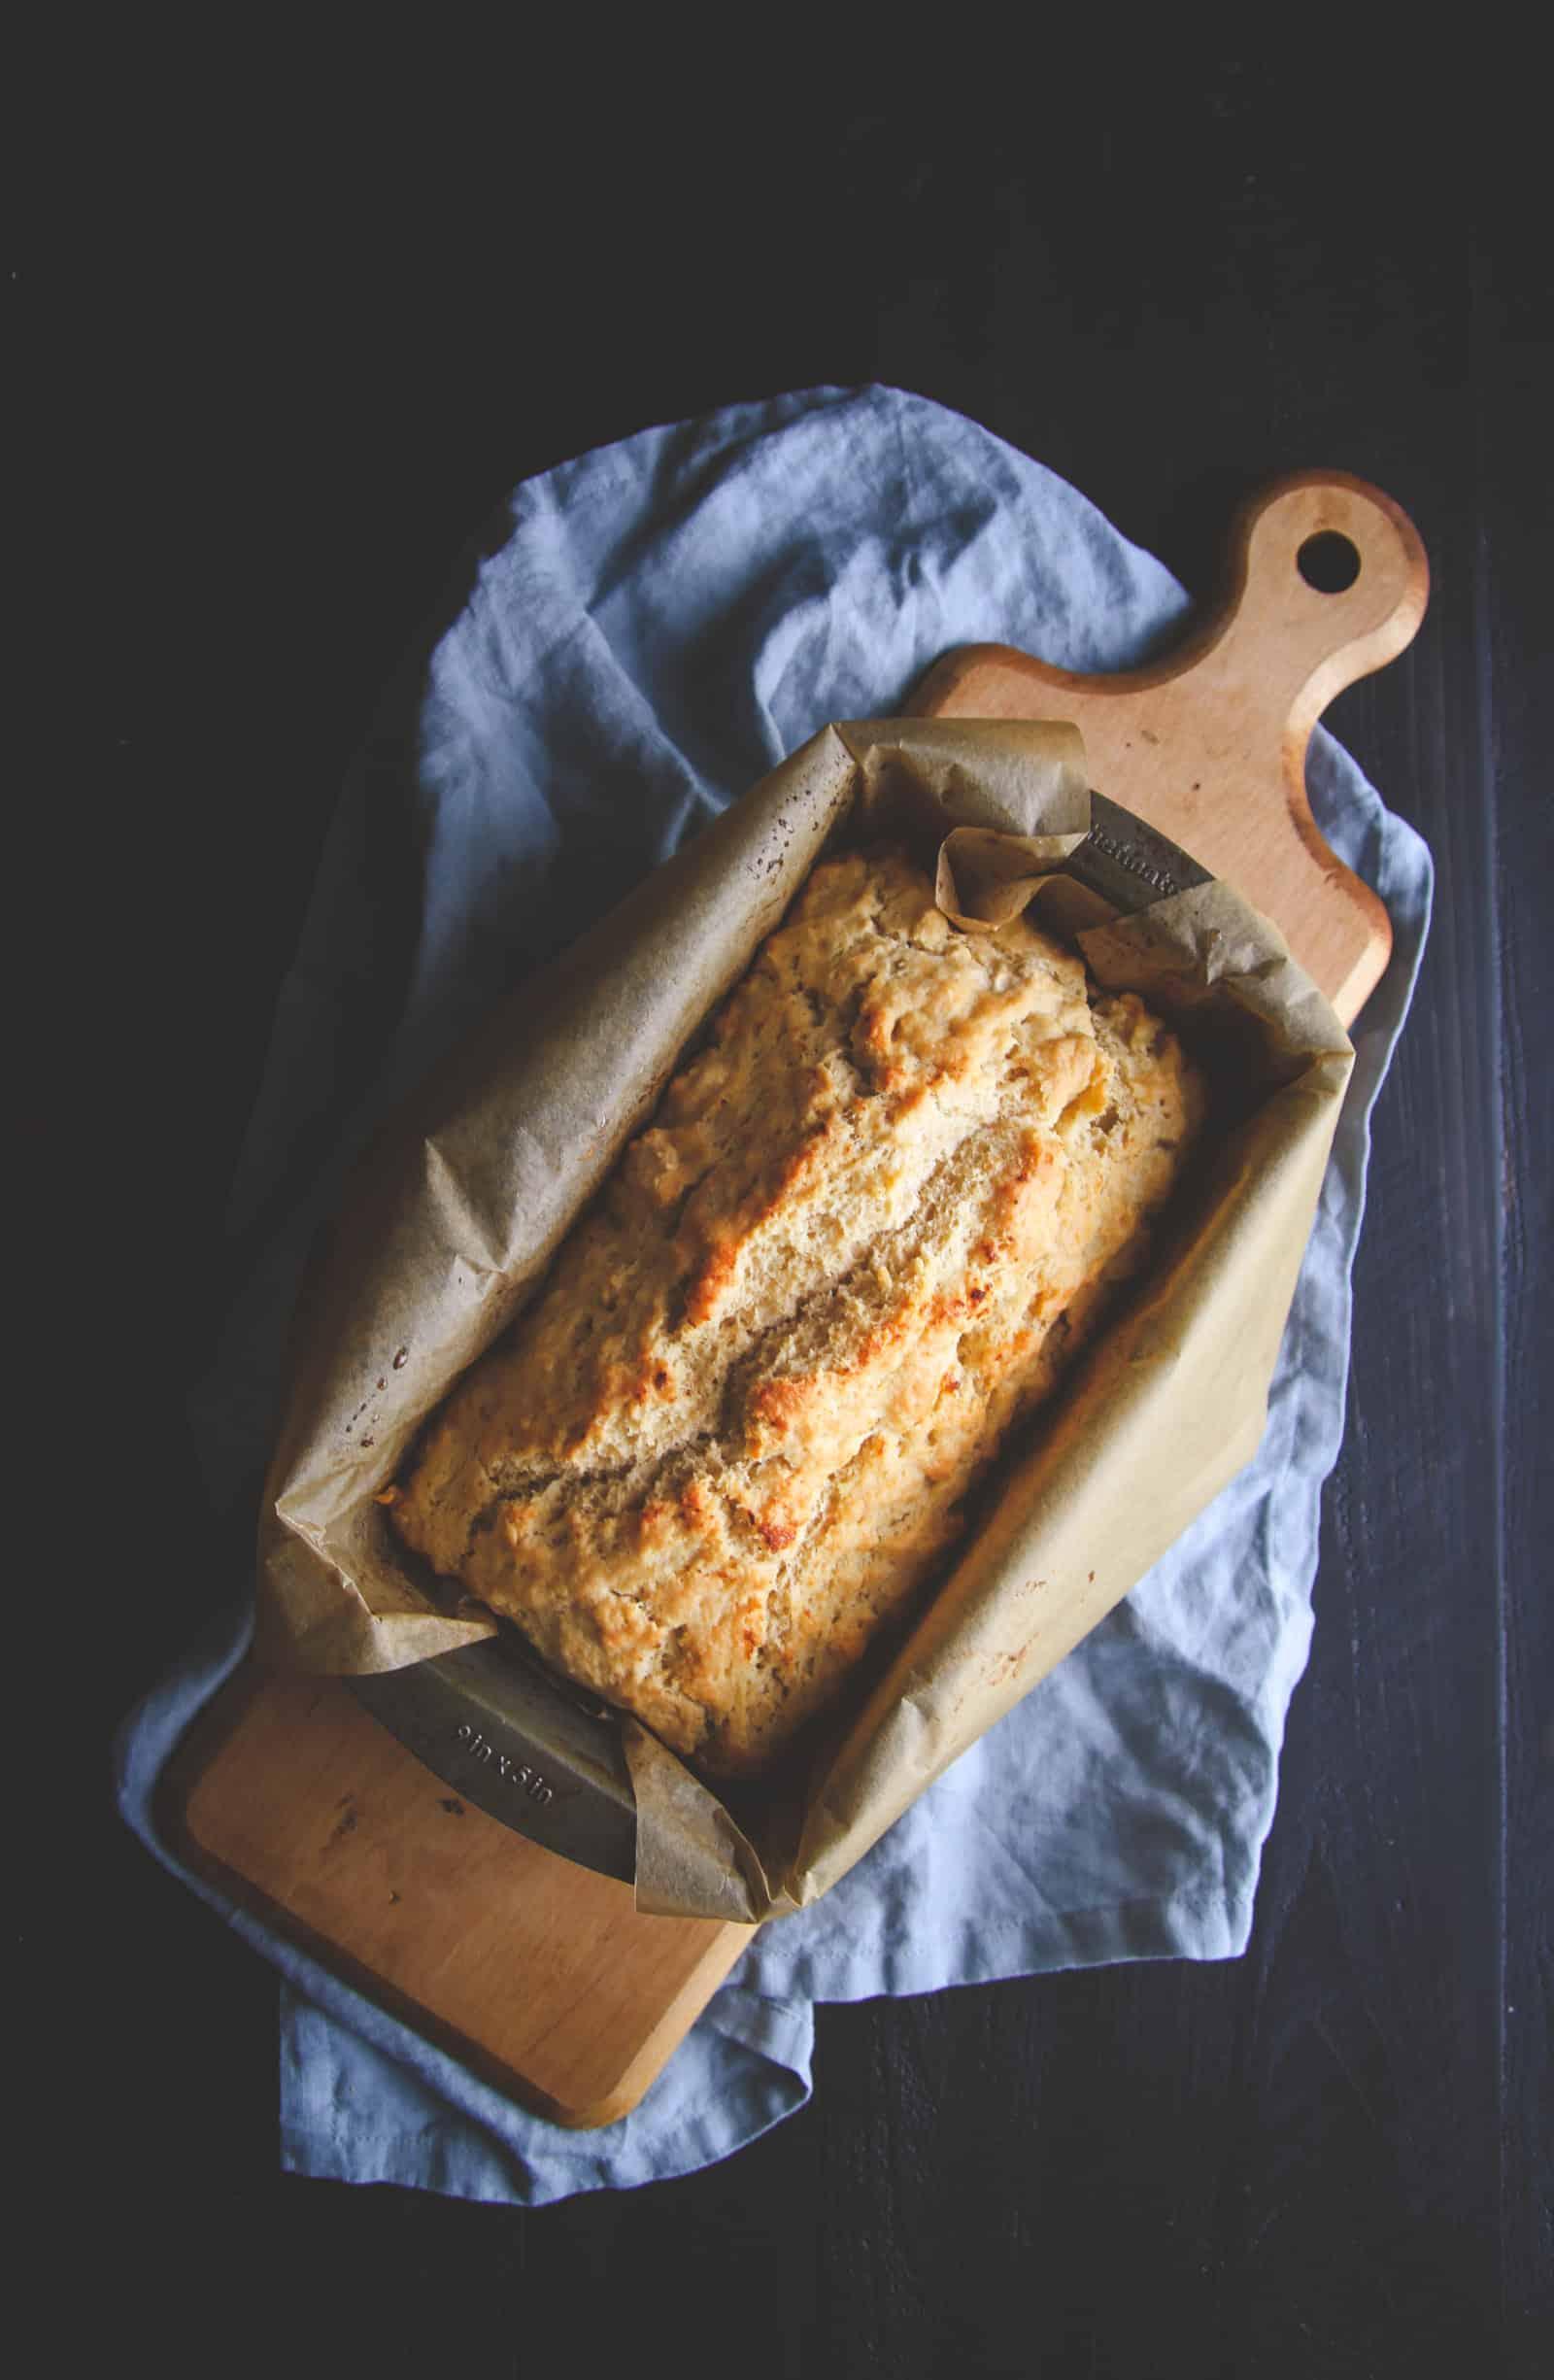 The most delicious beer bread recipe